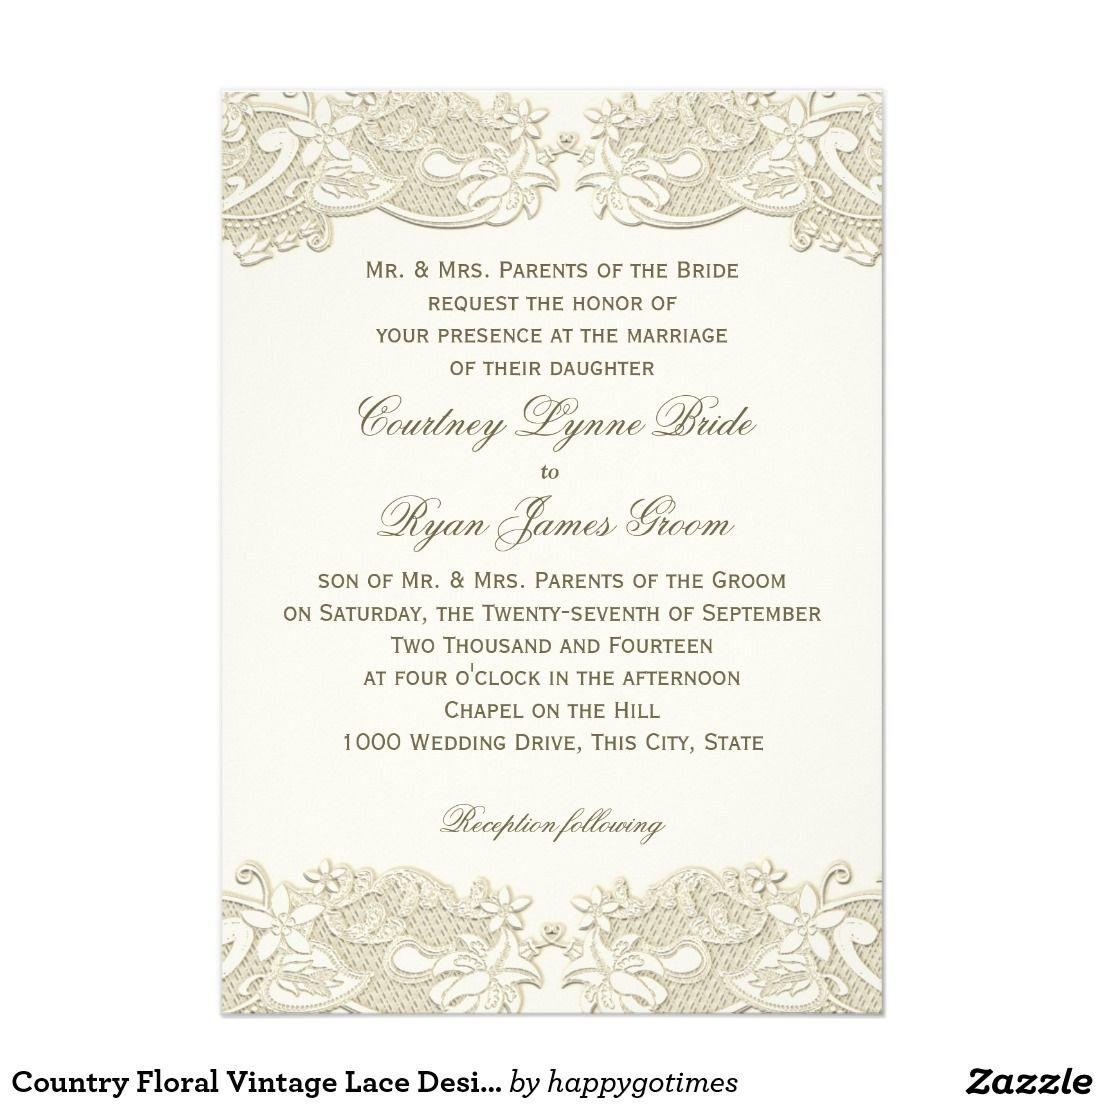 Country Floral Vintage Lace Design Wedding Card Vintage inspired ...